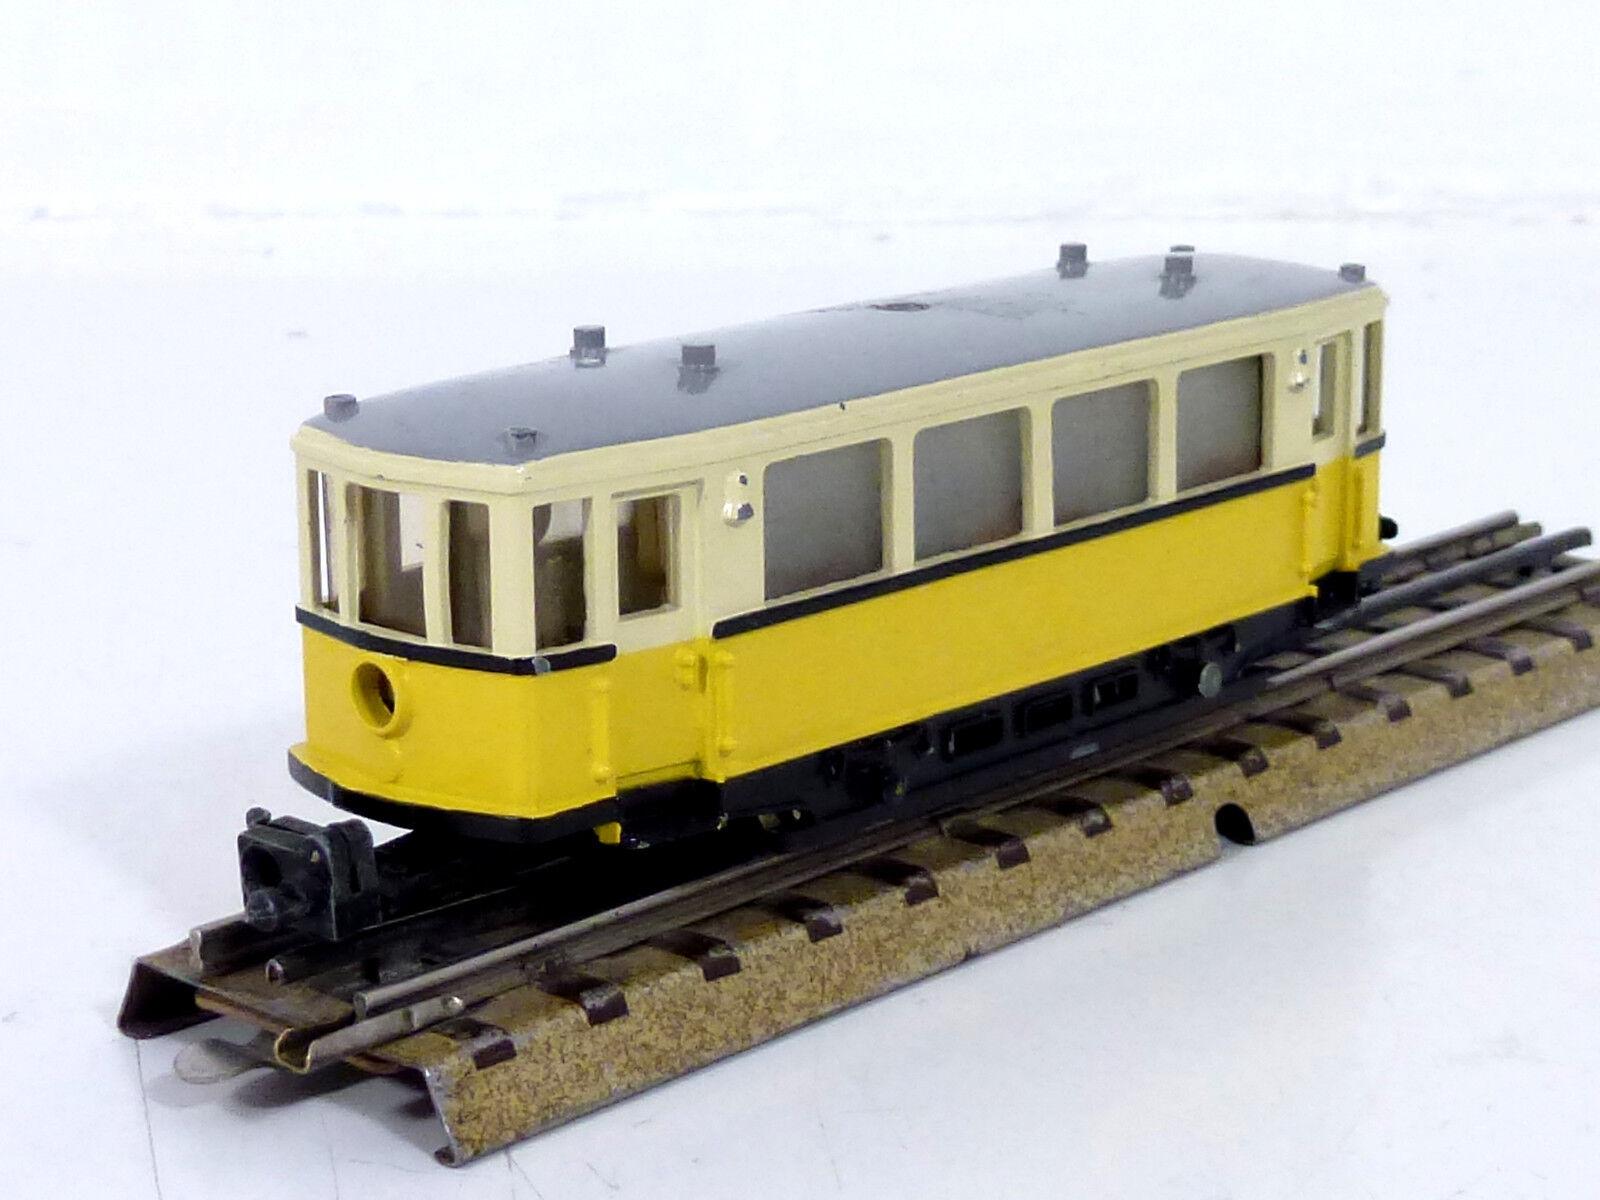 Märklin Hamo H0 00 Tram 1111 (250) Trailer Moulding 1950 60er Years, top 800